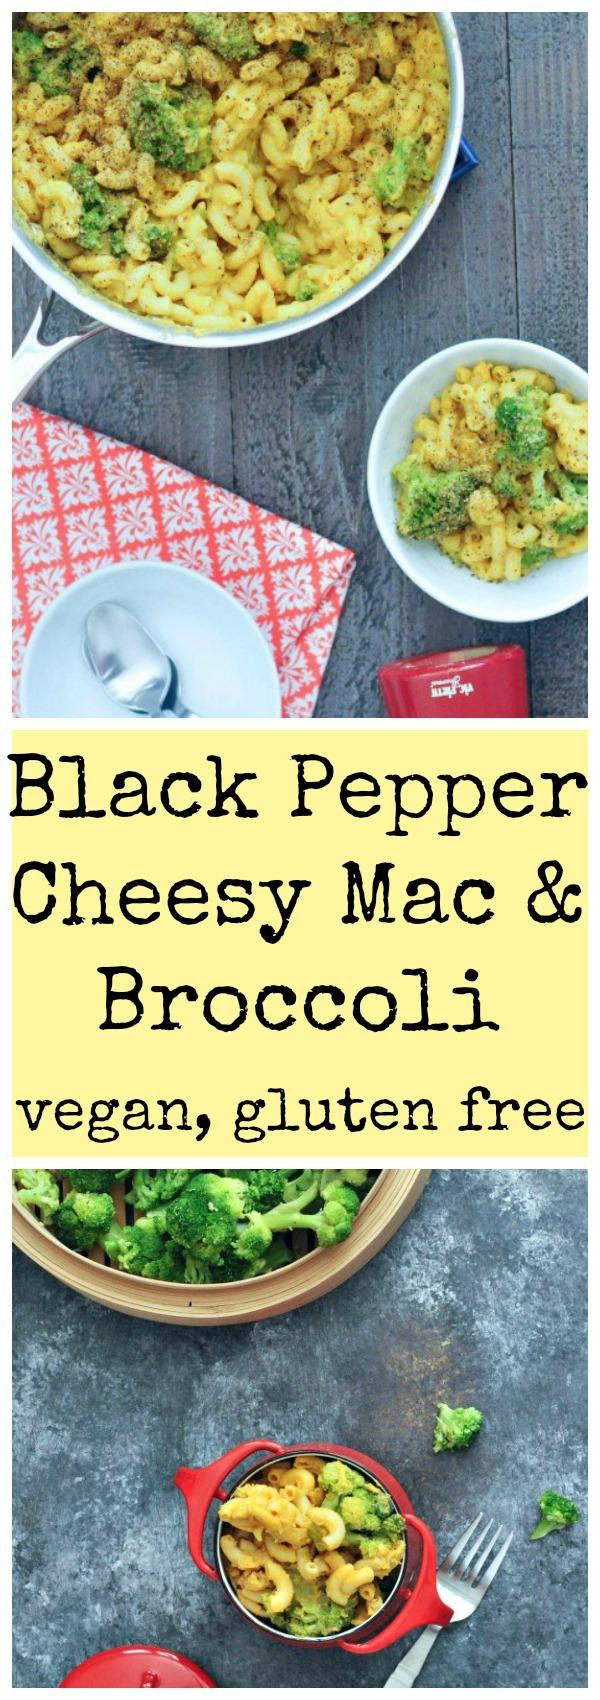 Black Pepper Cheesy Mac and Broccoli #Vegan @spabettie